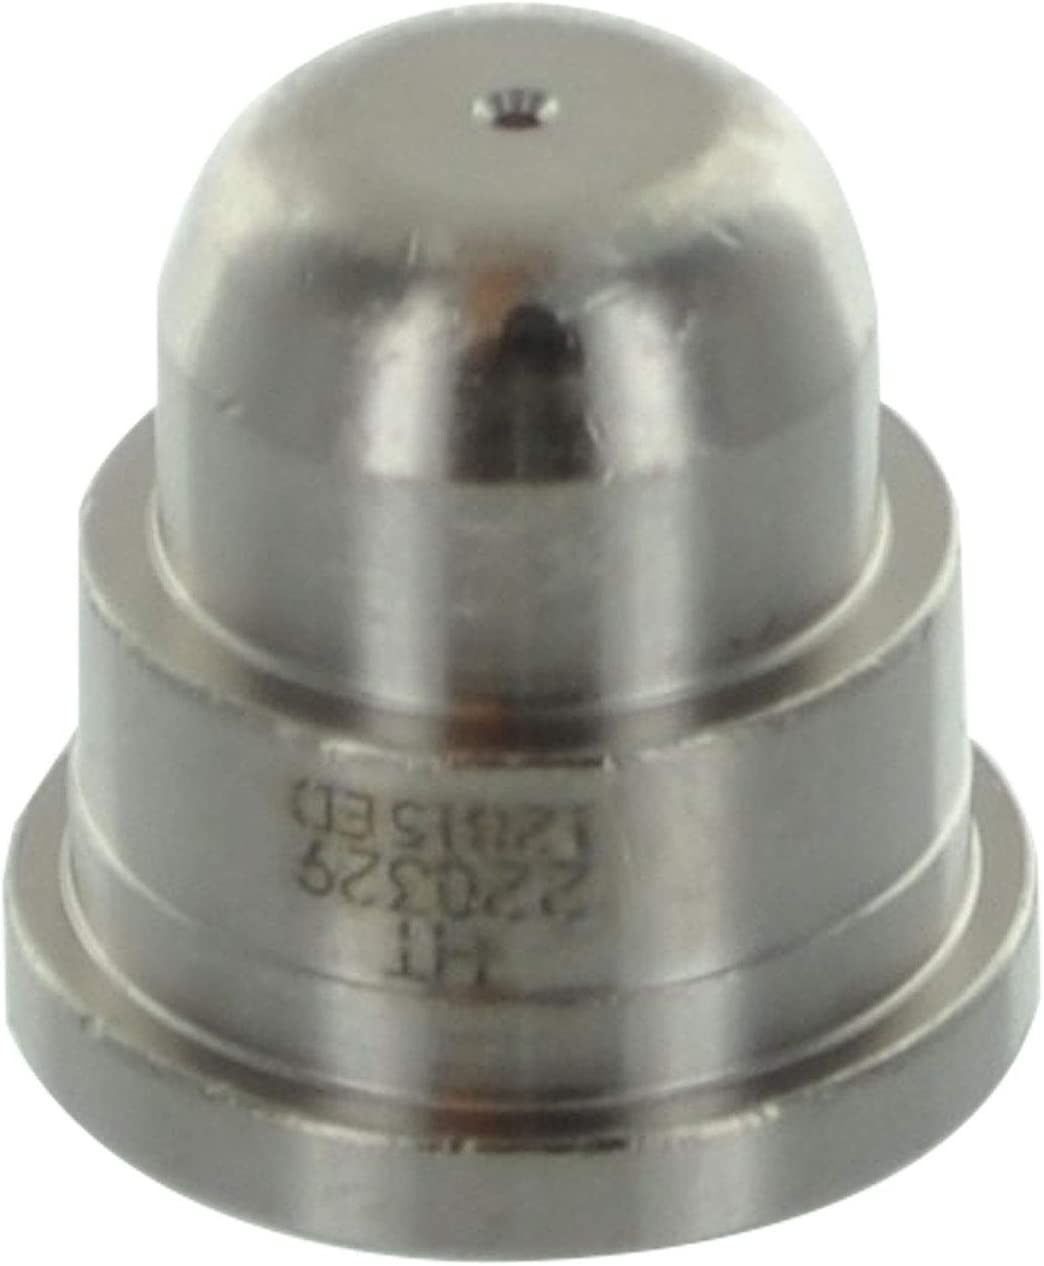 Hypertherm 220329 Popularity Max 43% OFF Nozzle Finecut Pkg 5 =